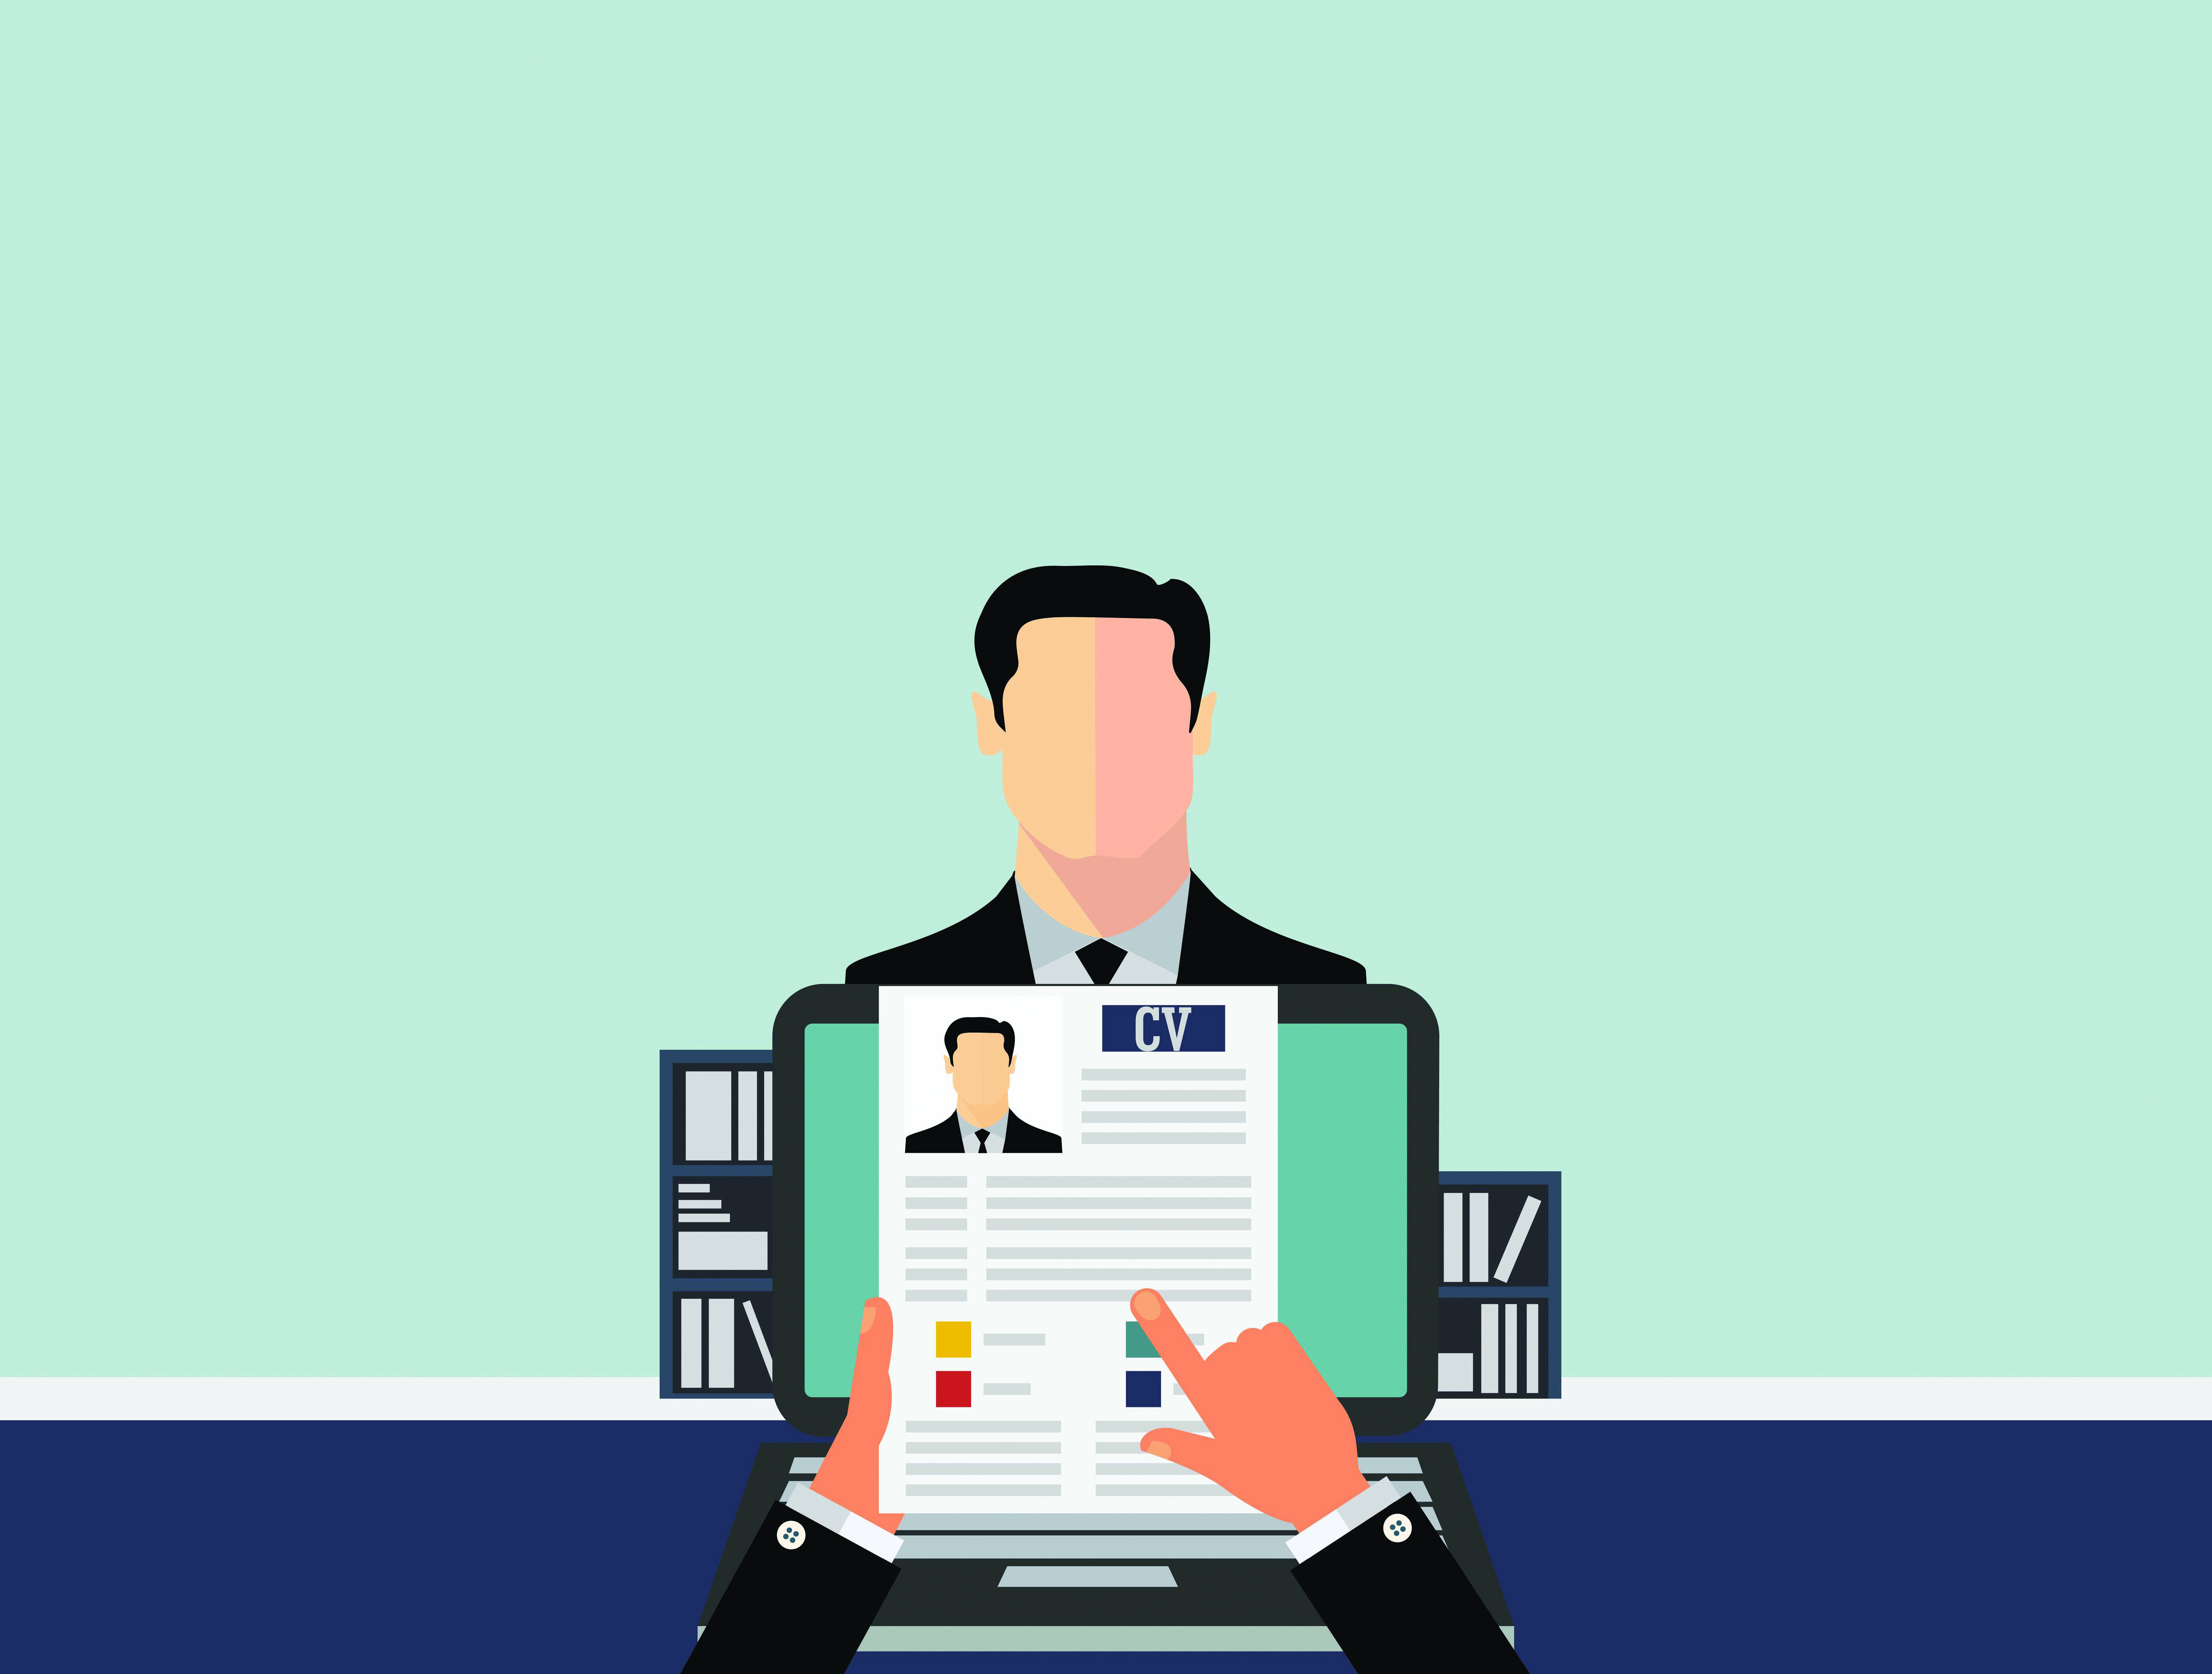 10 essential CV tips